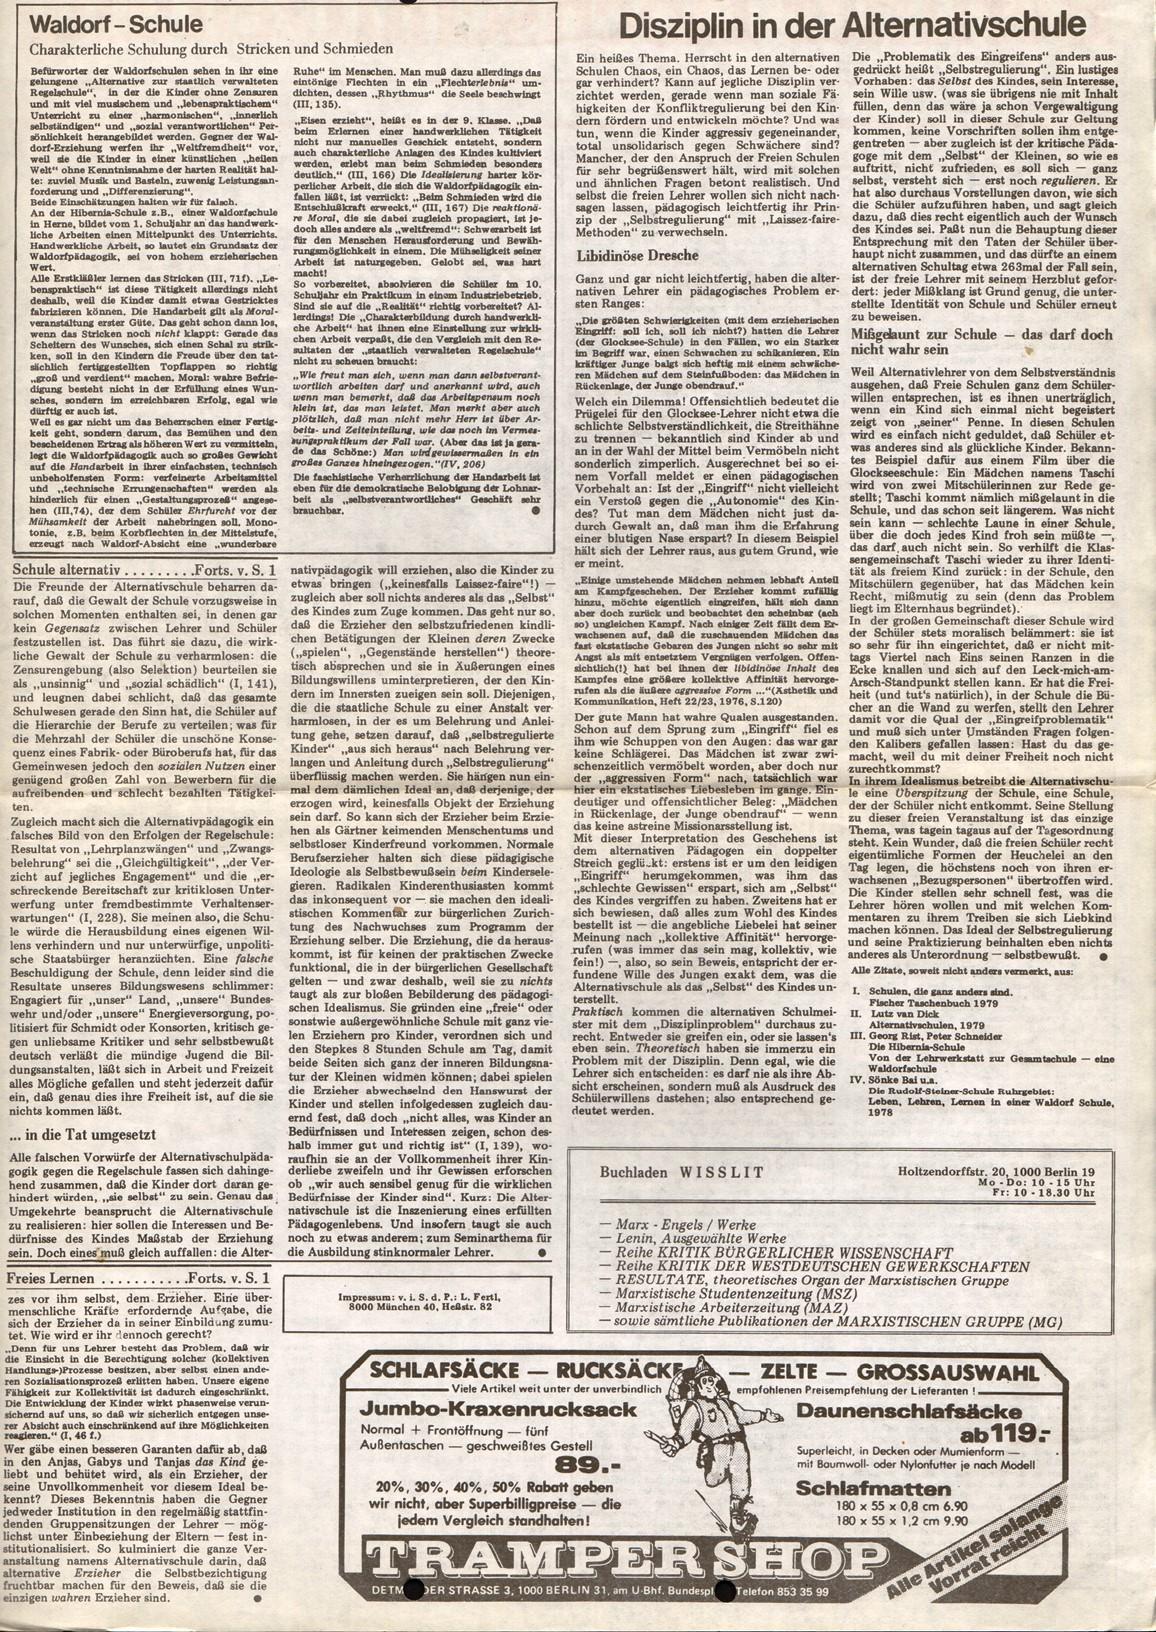 Berlin_MG_Hochschulzeitung_19800000_Paed_02